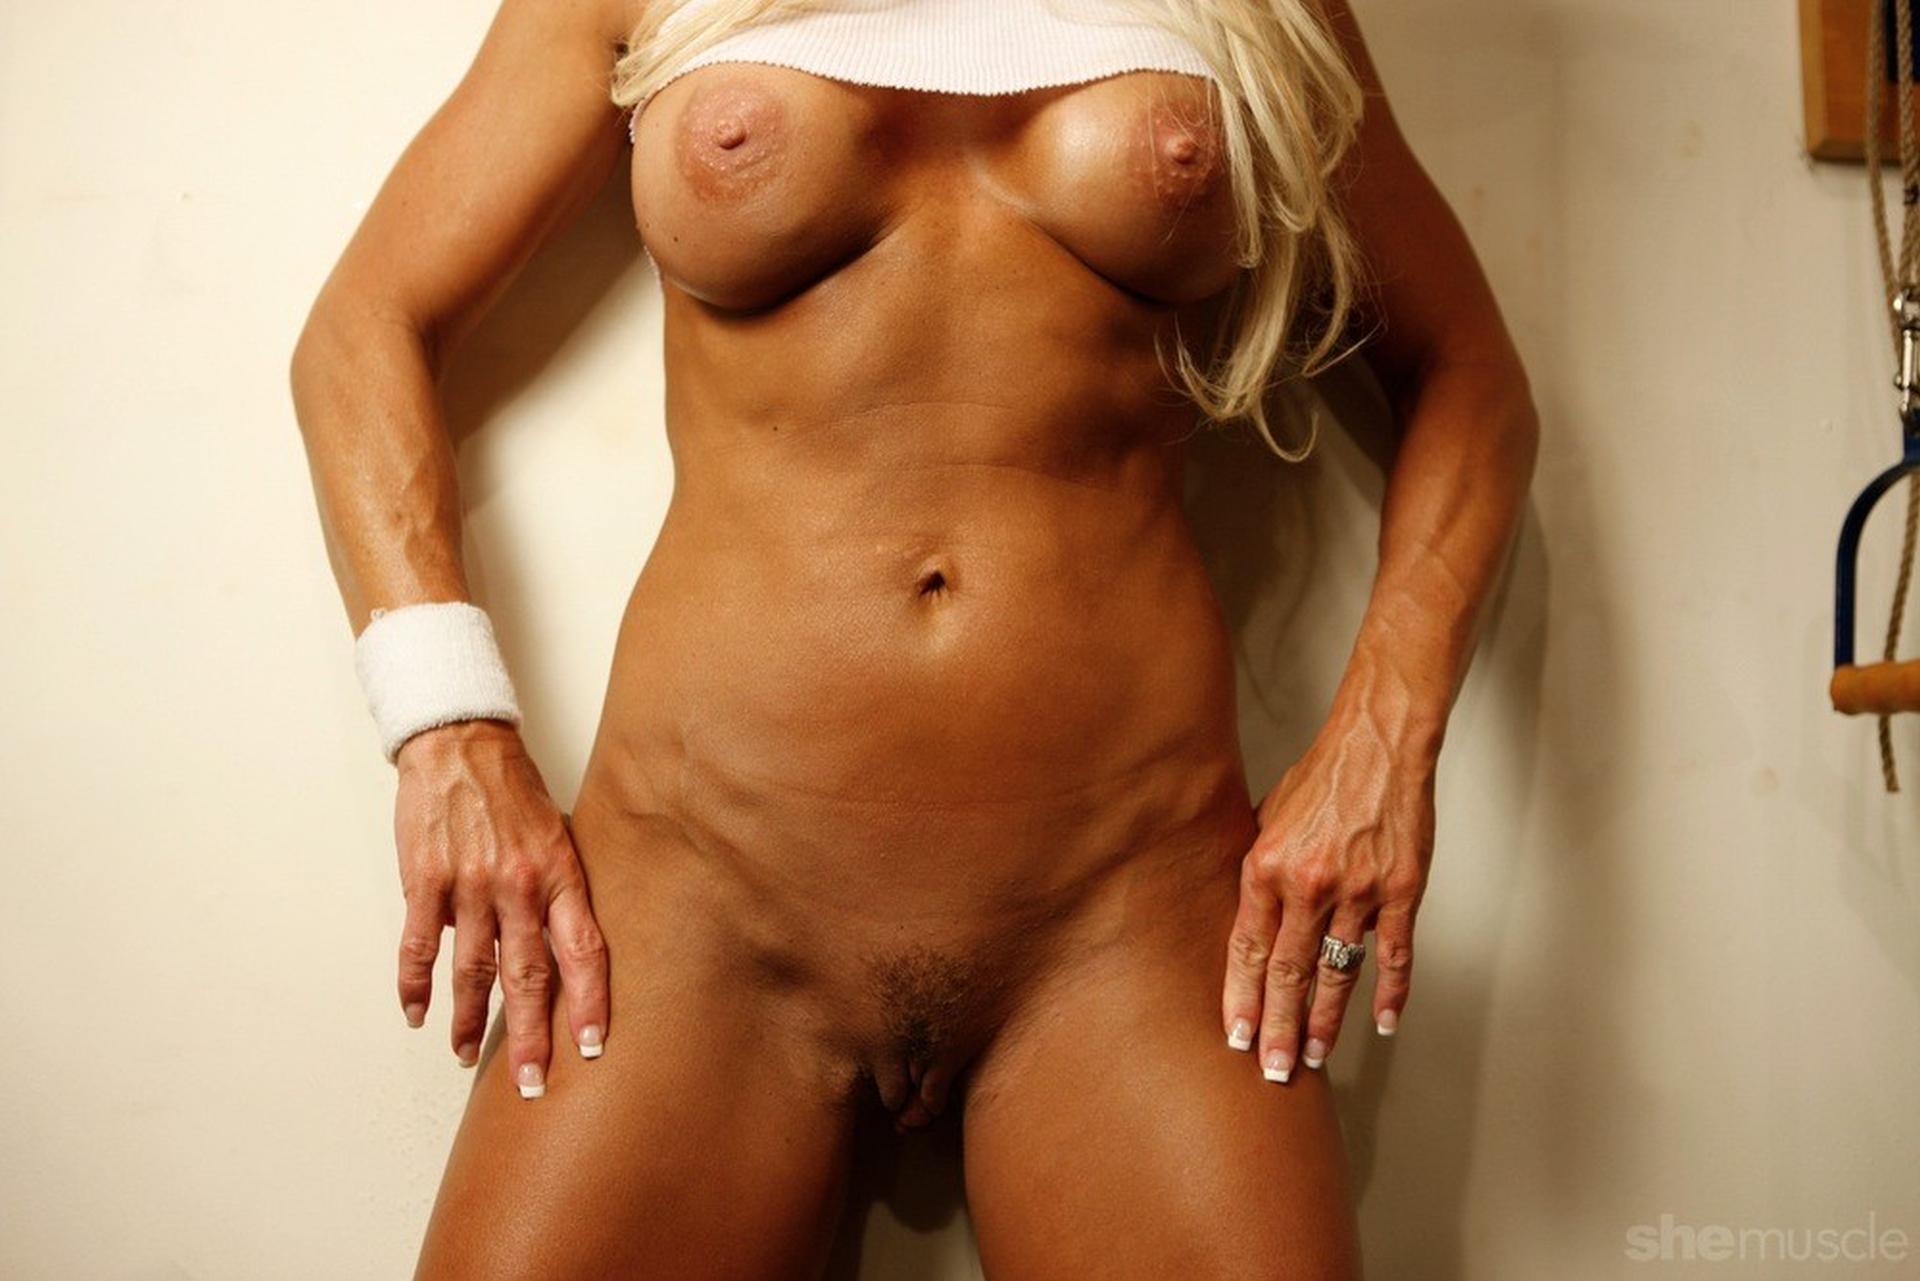 hd nudist girls dark rooms